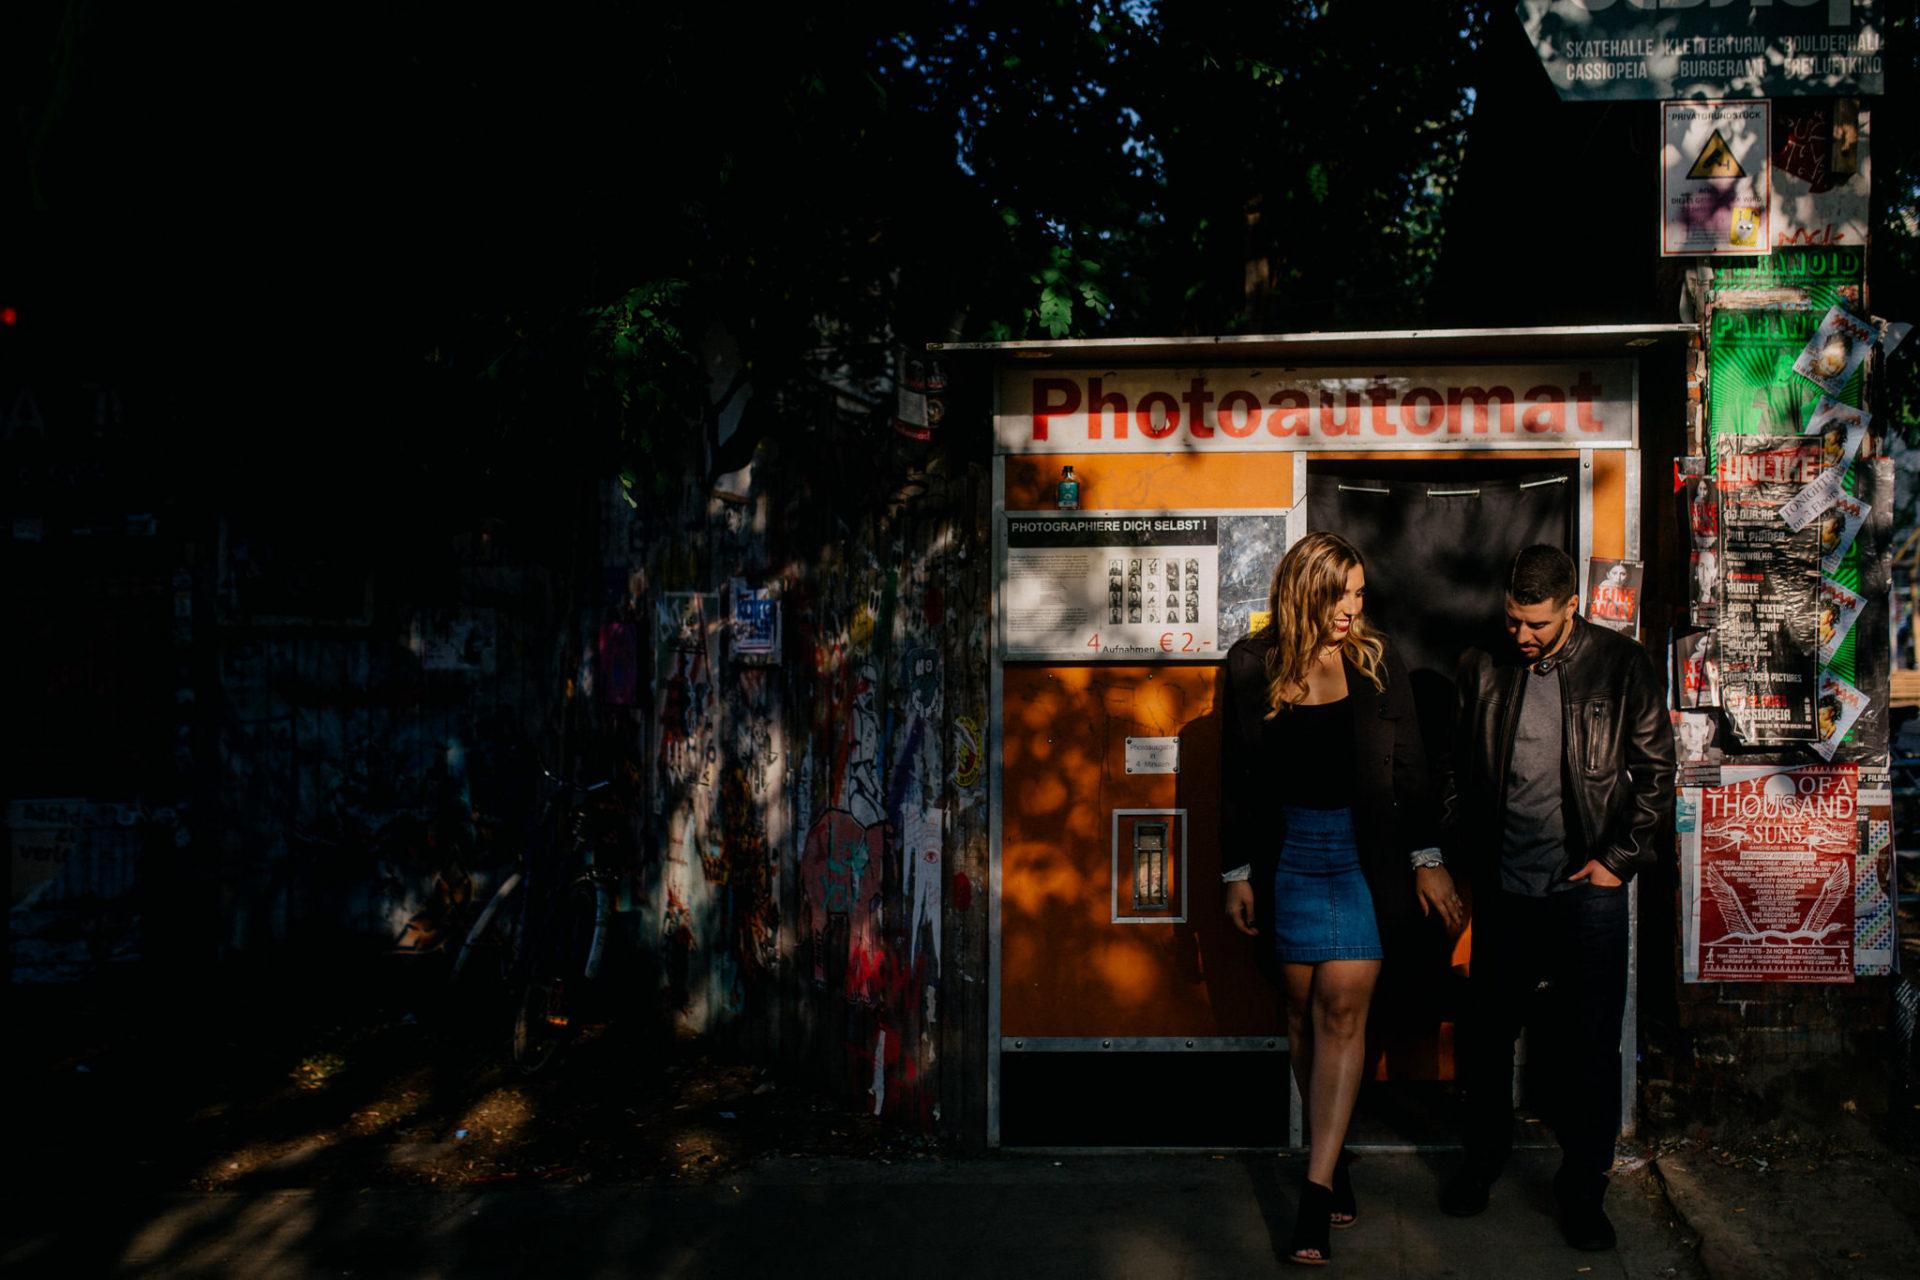 verlobungsfotos Berlin-RAW Gelände-Fotoautomat Berlin